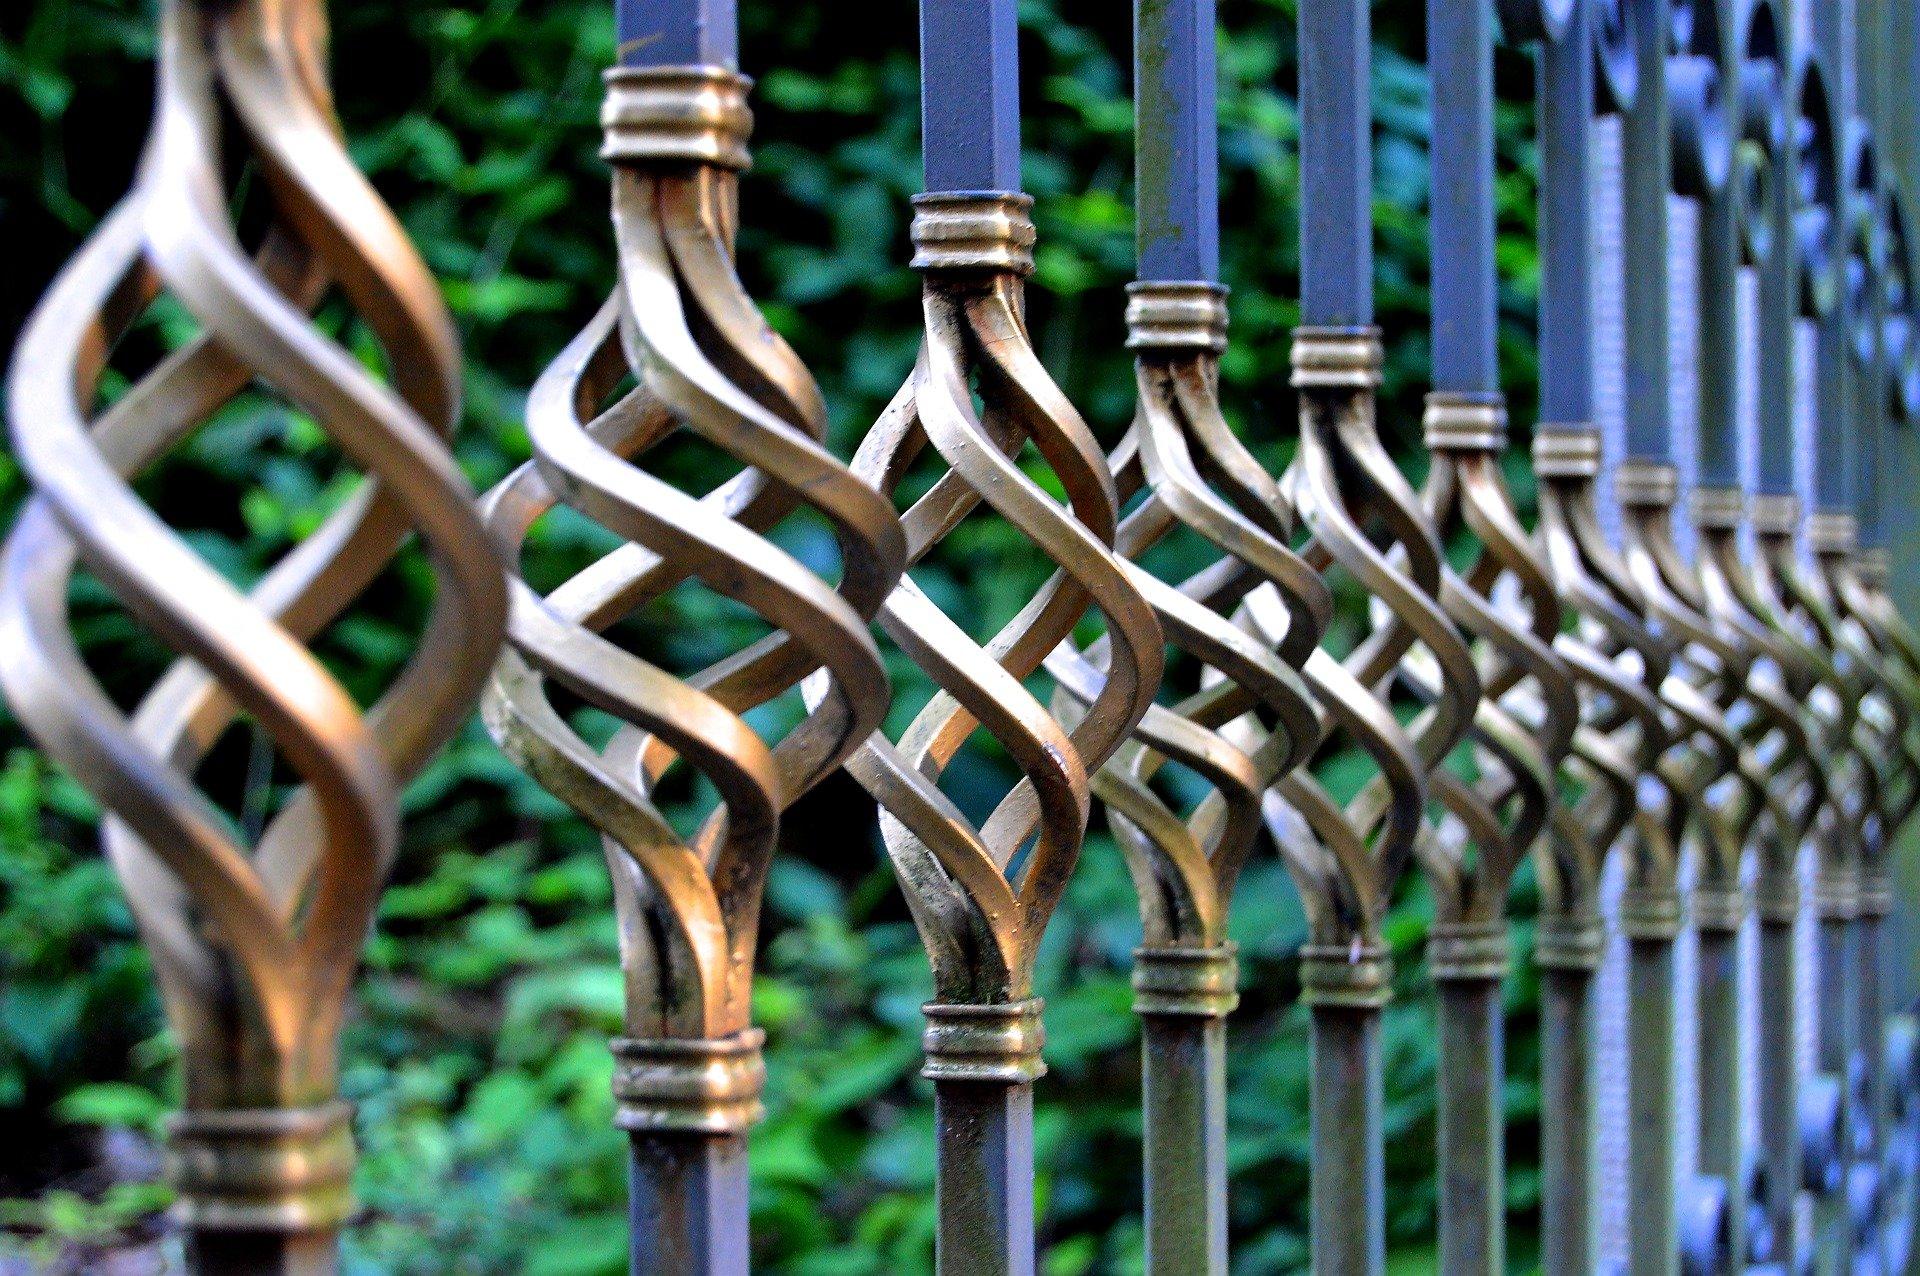 iron-gate-1623303_1920